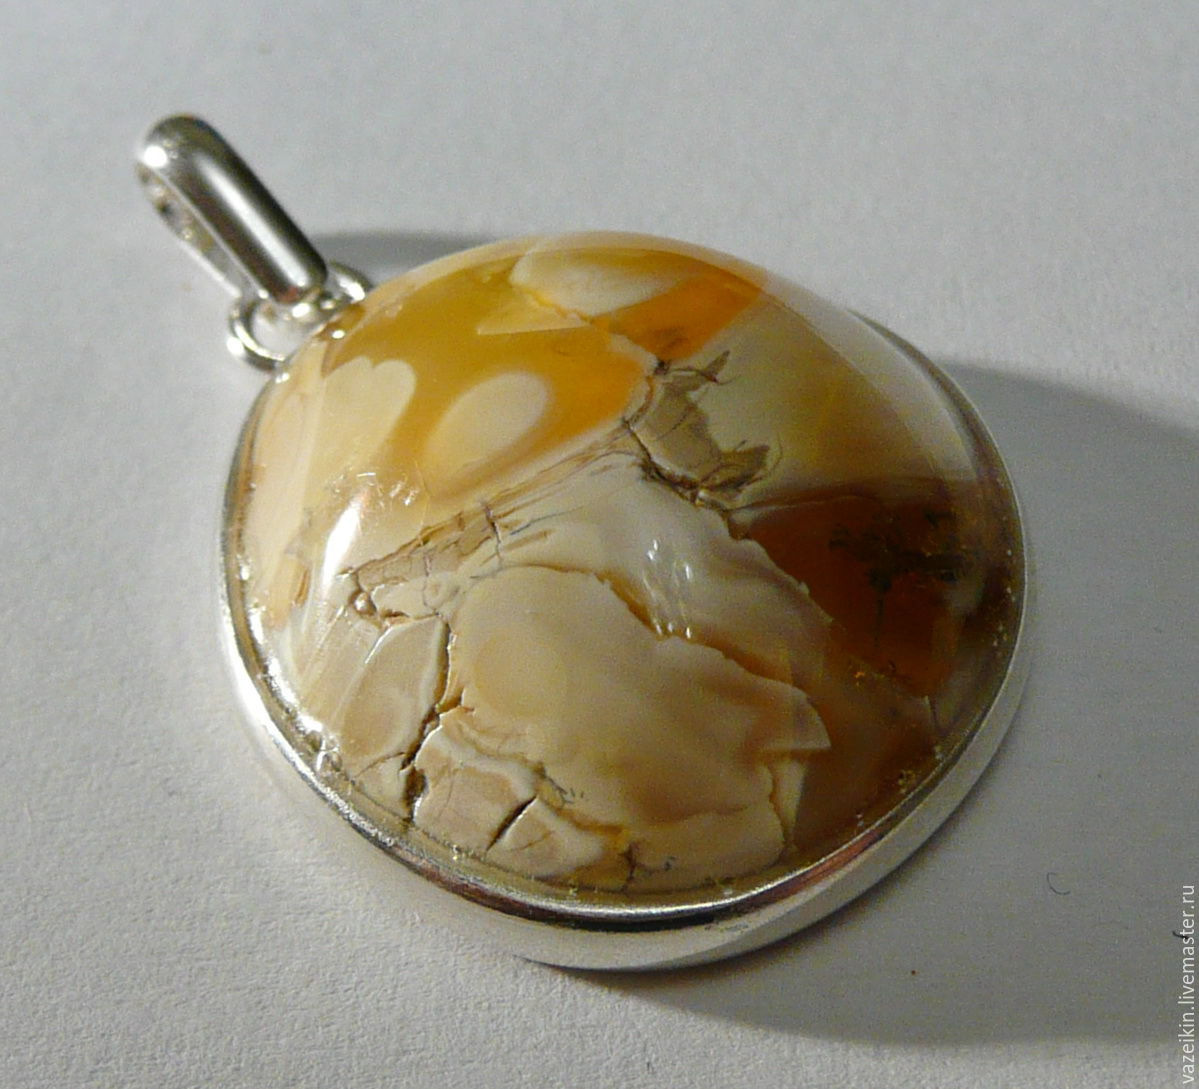 Amber pendant K-437 'Rarity', Pendants, Svetlogorsk,  Фото №1